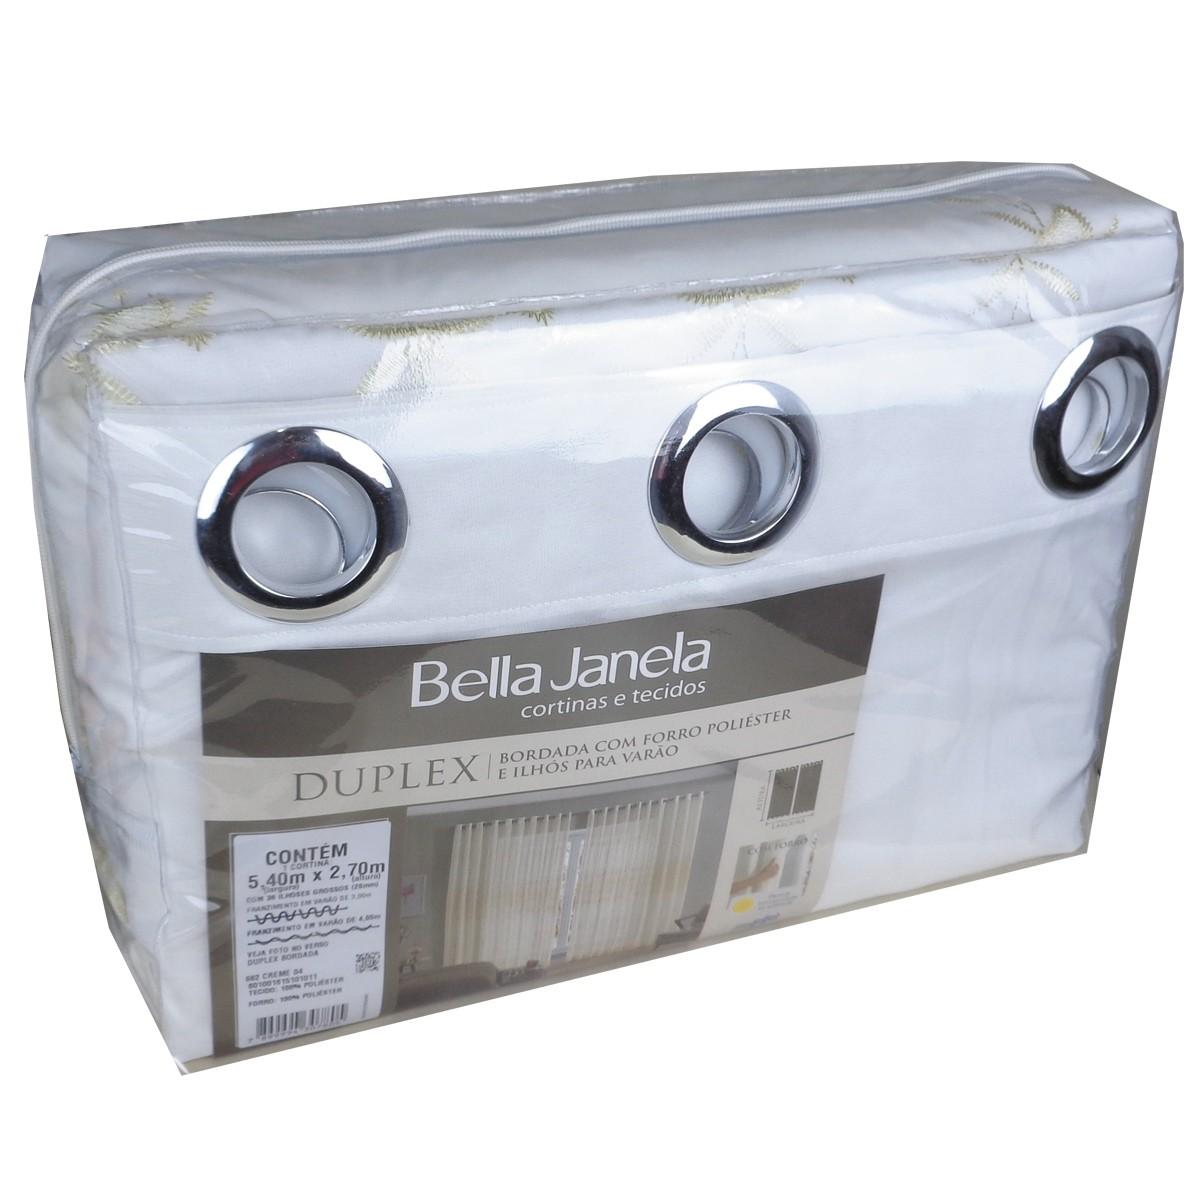 Cortina Duplex Bordada Creme 5,40 x 2,70 Bella Janela